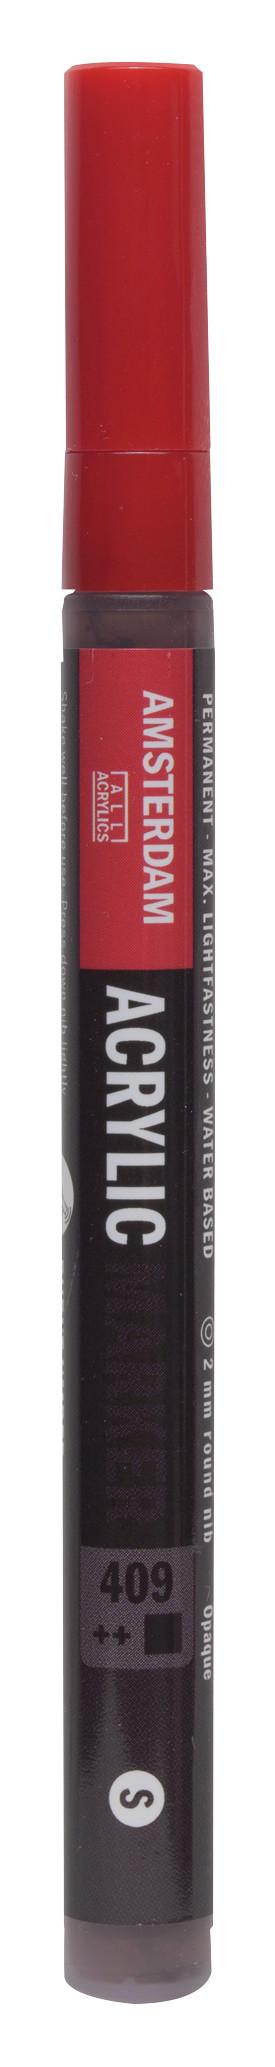 Amsterdam Acrylic Marker 2 mm Burnt Umber 409